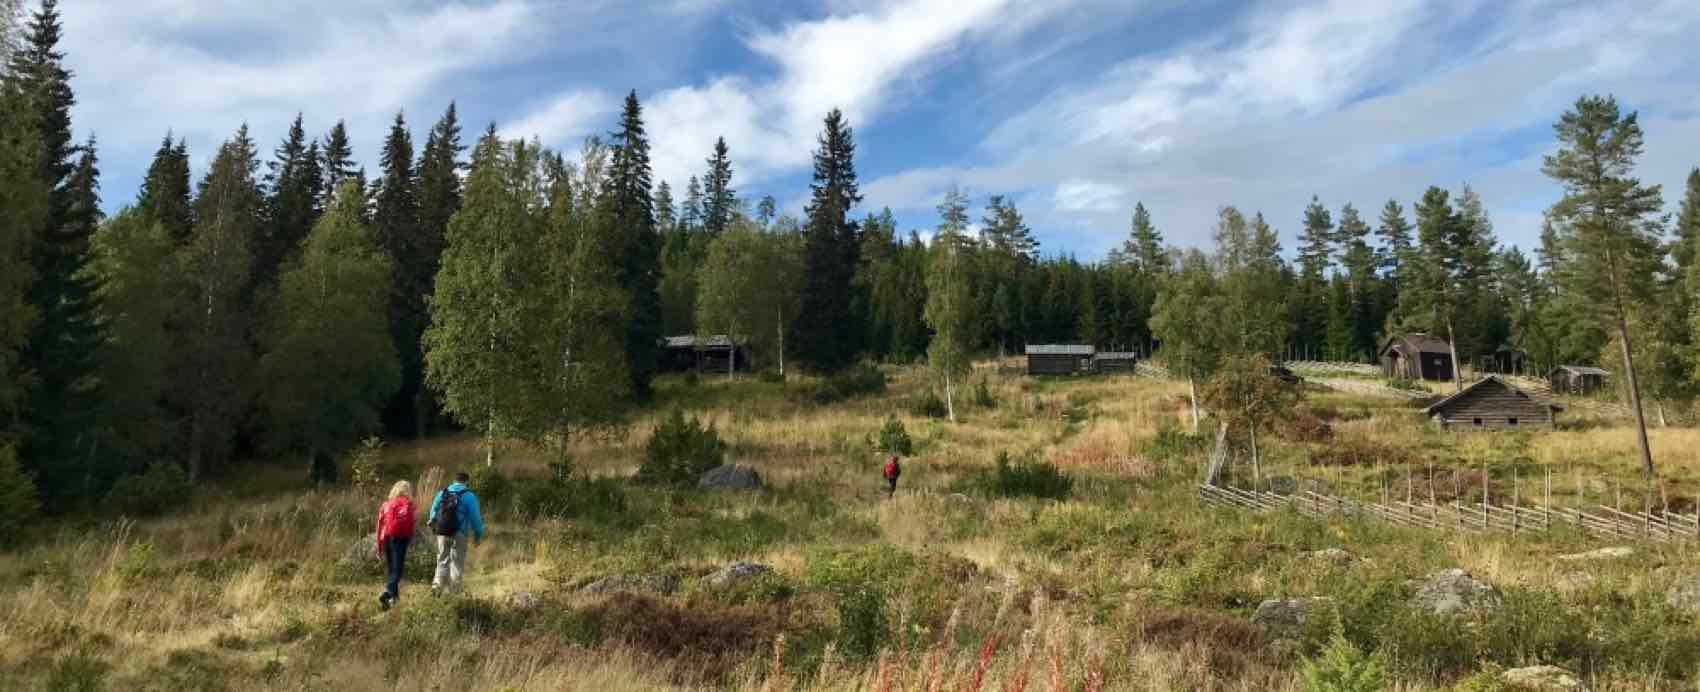 ferie i Vest Sverige